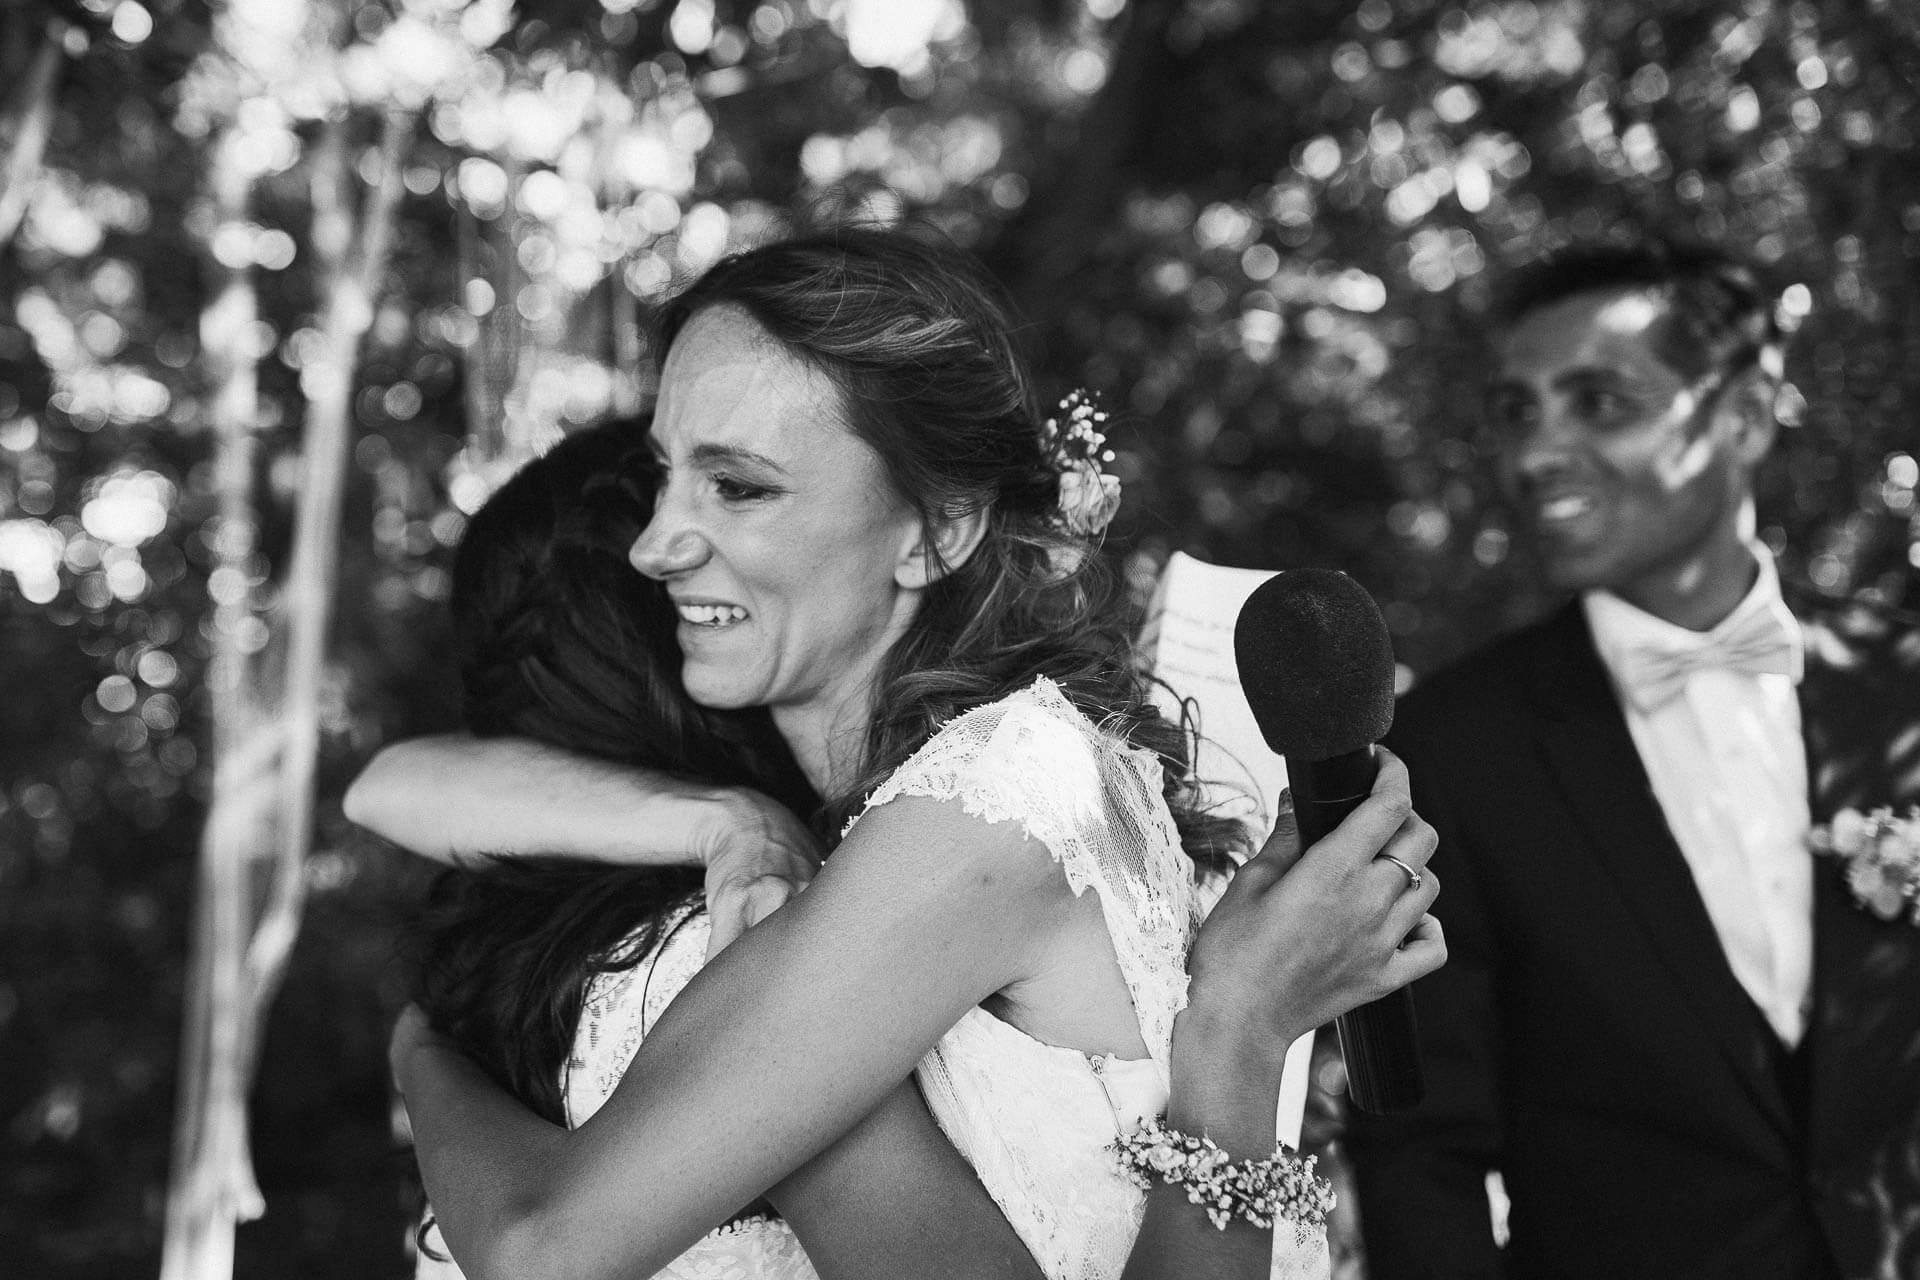 photographe-mariage-aix-en-provence-stephanie-jerome-12